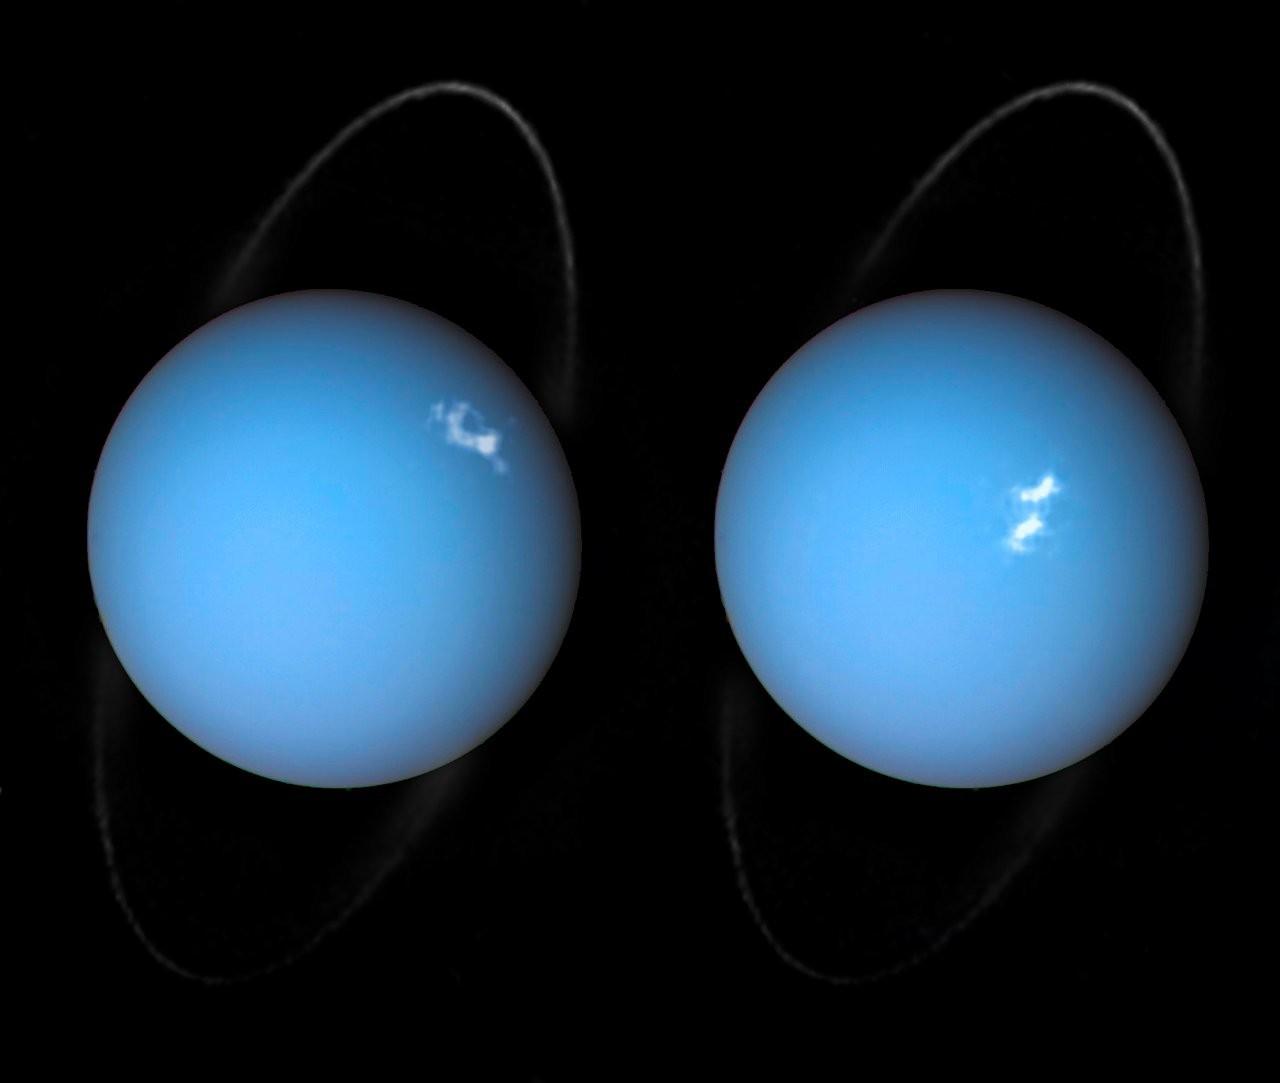 (Foto: Wikimedia commons/NASA/Hubble)